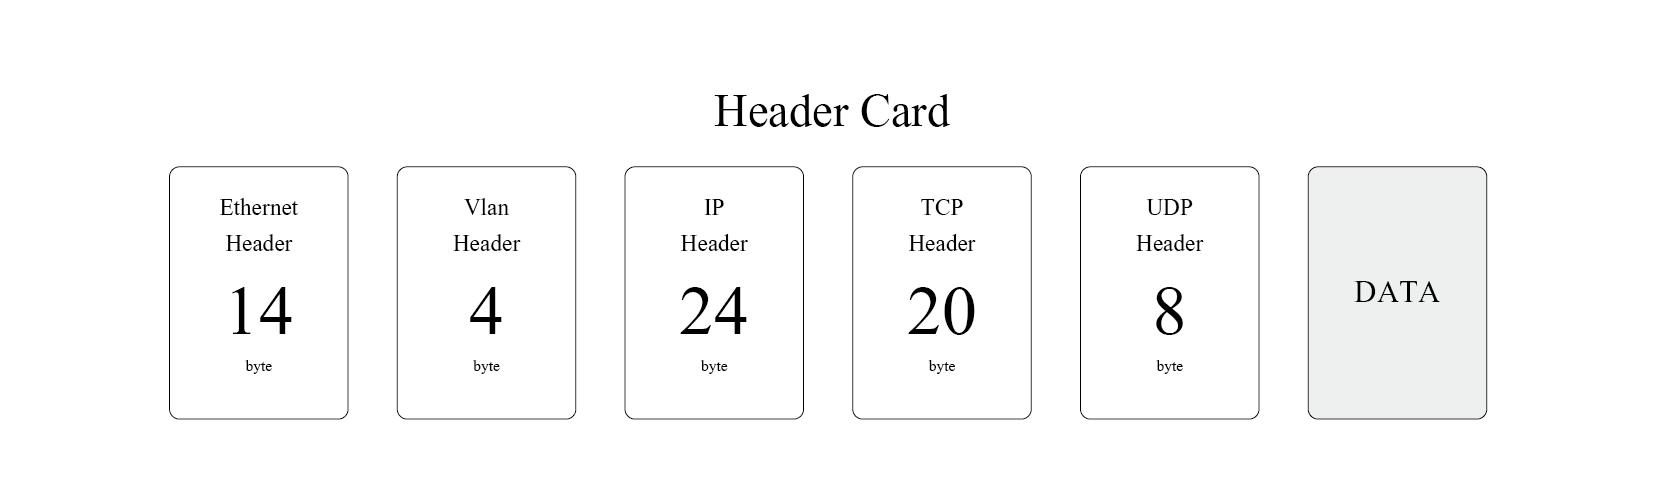 header_card